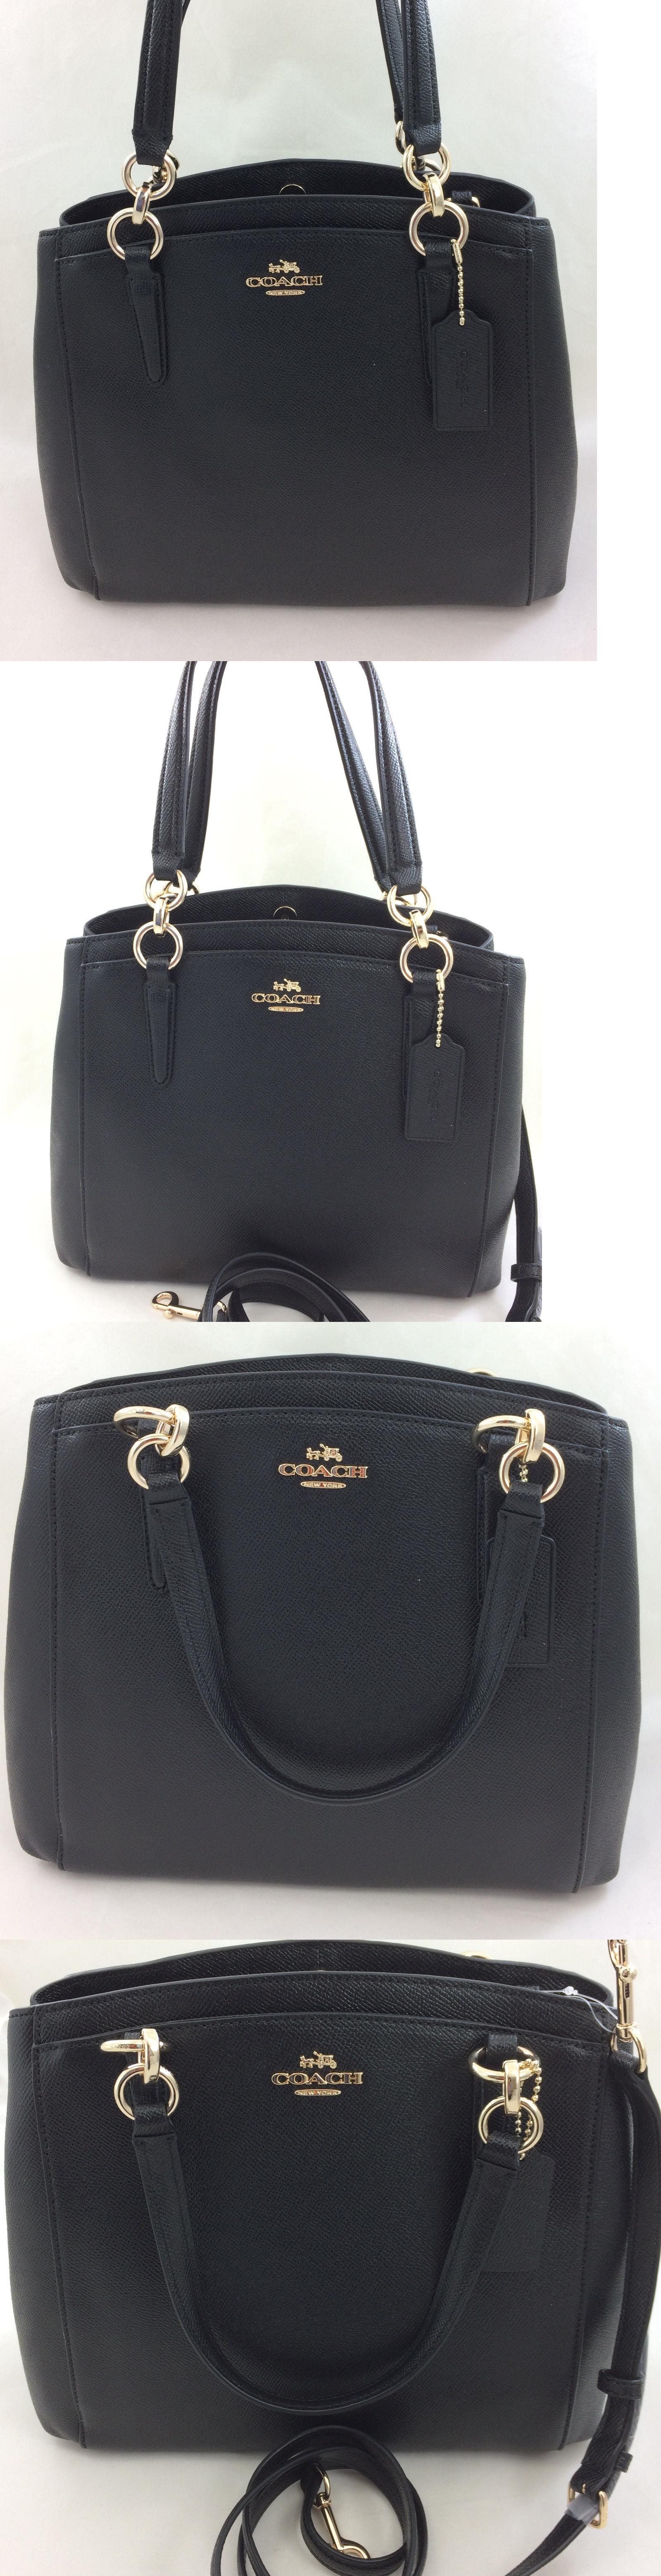 2ce2b47f5340b 1234 6b7b9 d0e4c low cost handbags and purses 63852 new coach f57847  crossgrain leather minetta handbag crossbody shoulder bag ...